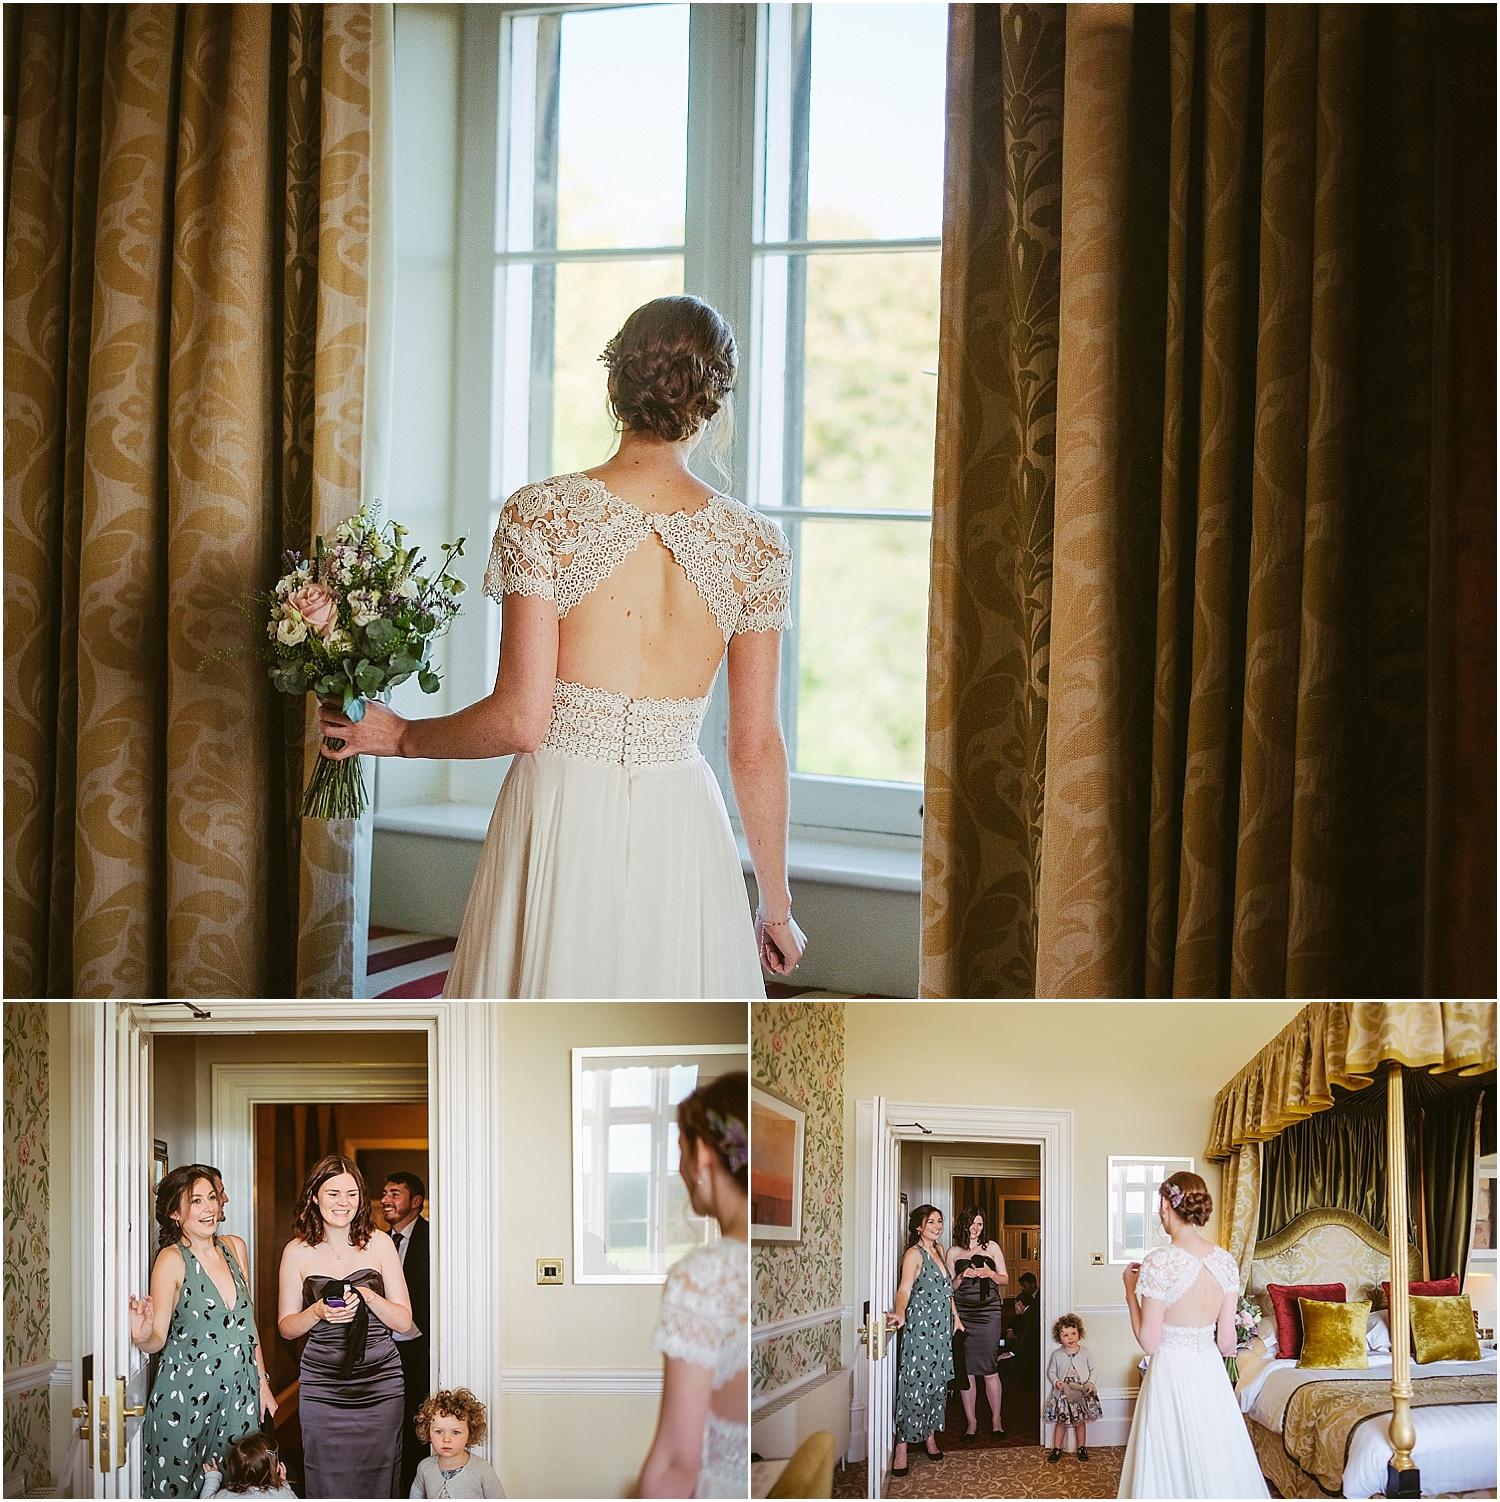 Wedding photos at Matfen Hall 009.jpg